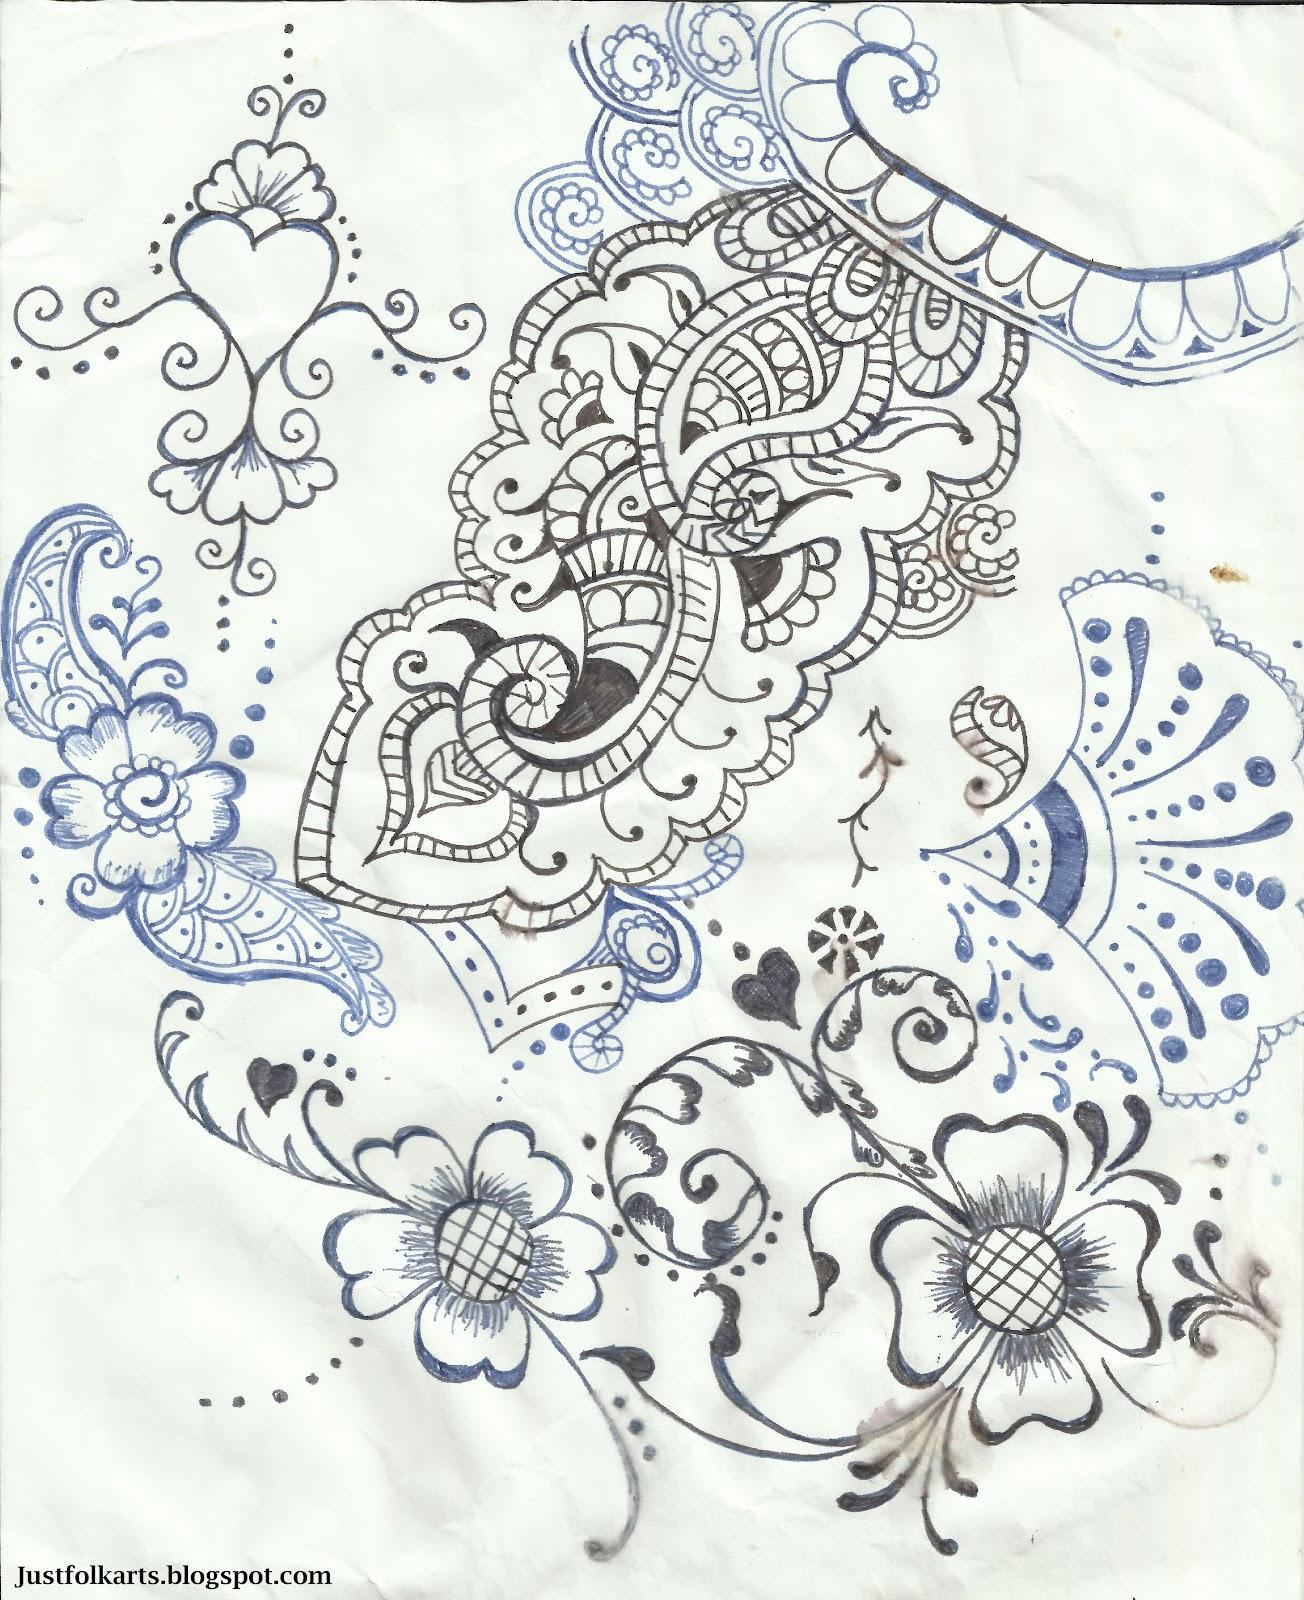 Black Henna Tattoo While Pregnant: Just Folk Art: A Word About Henna Tattoos